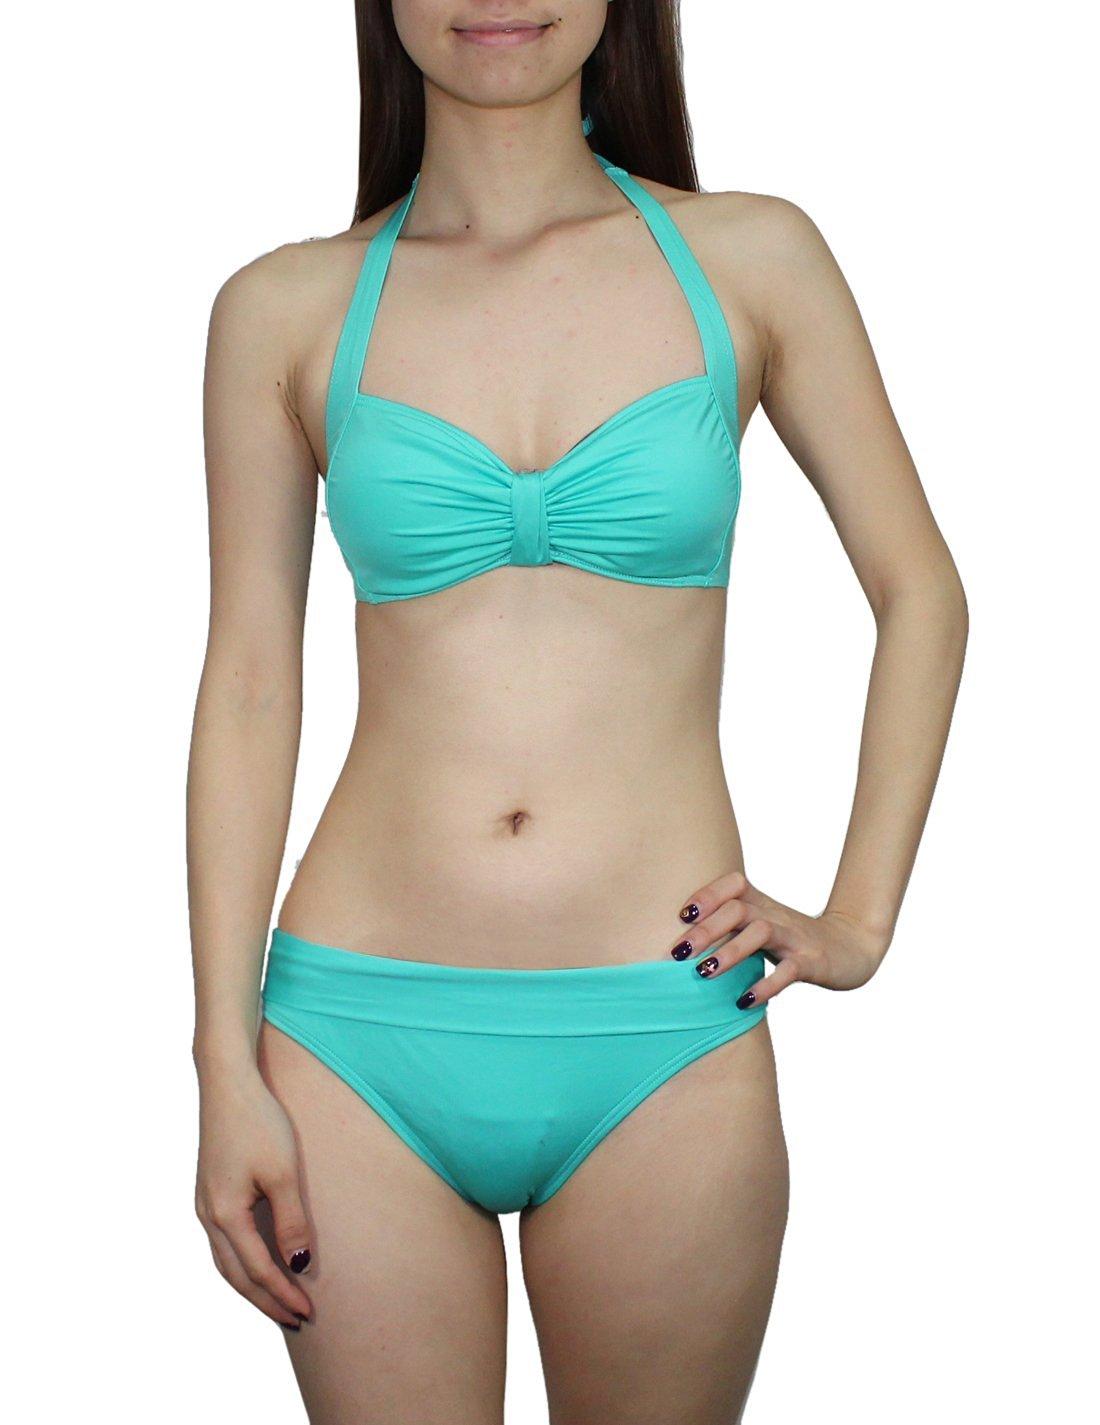 94ee157726db6 Get Quotations · 2 PCS SET Womens Buffalo Bikini Top & Bottom Dri-Fit Surf  Swimsuit S/